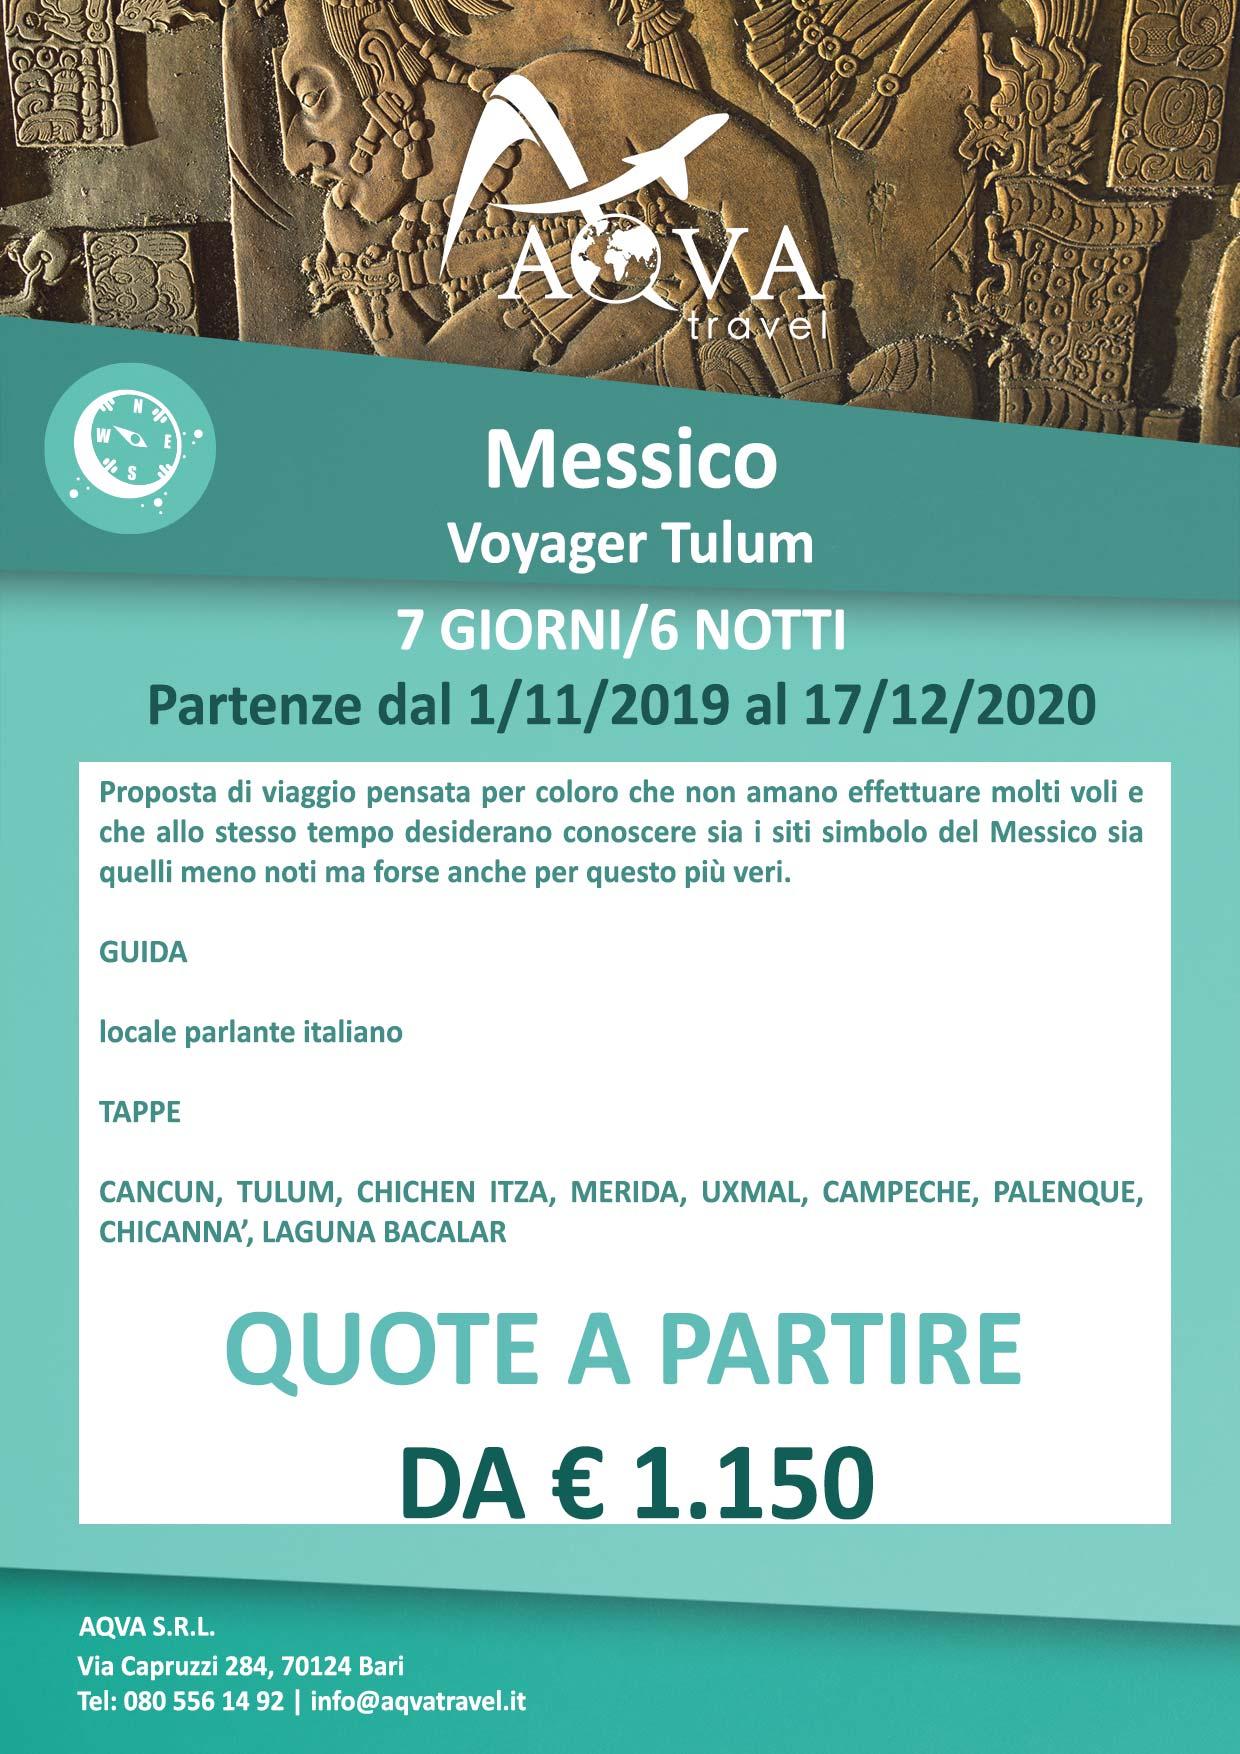 offerte-viaggi-Messico-Avventura-offerte-agenzia-di-viaggi-Bari-AQVATRAVEL-it